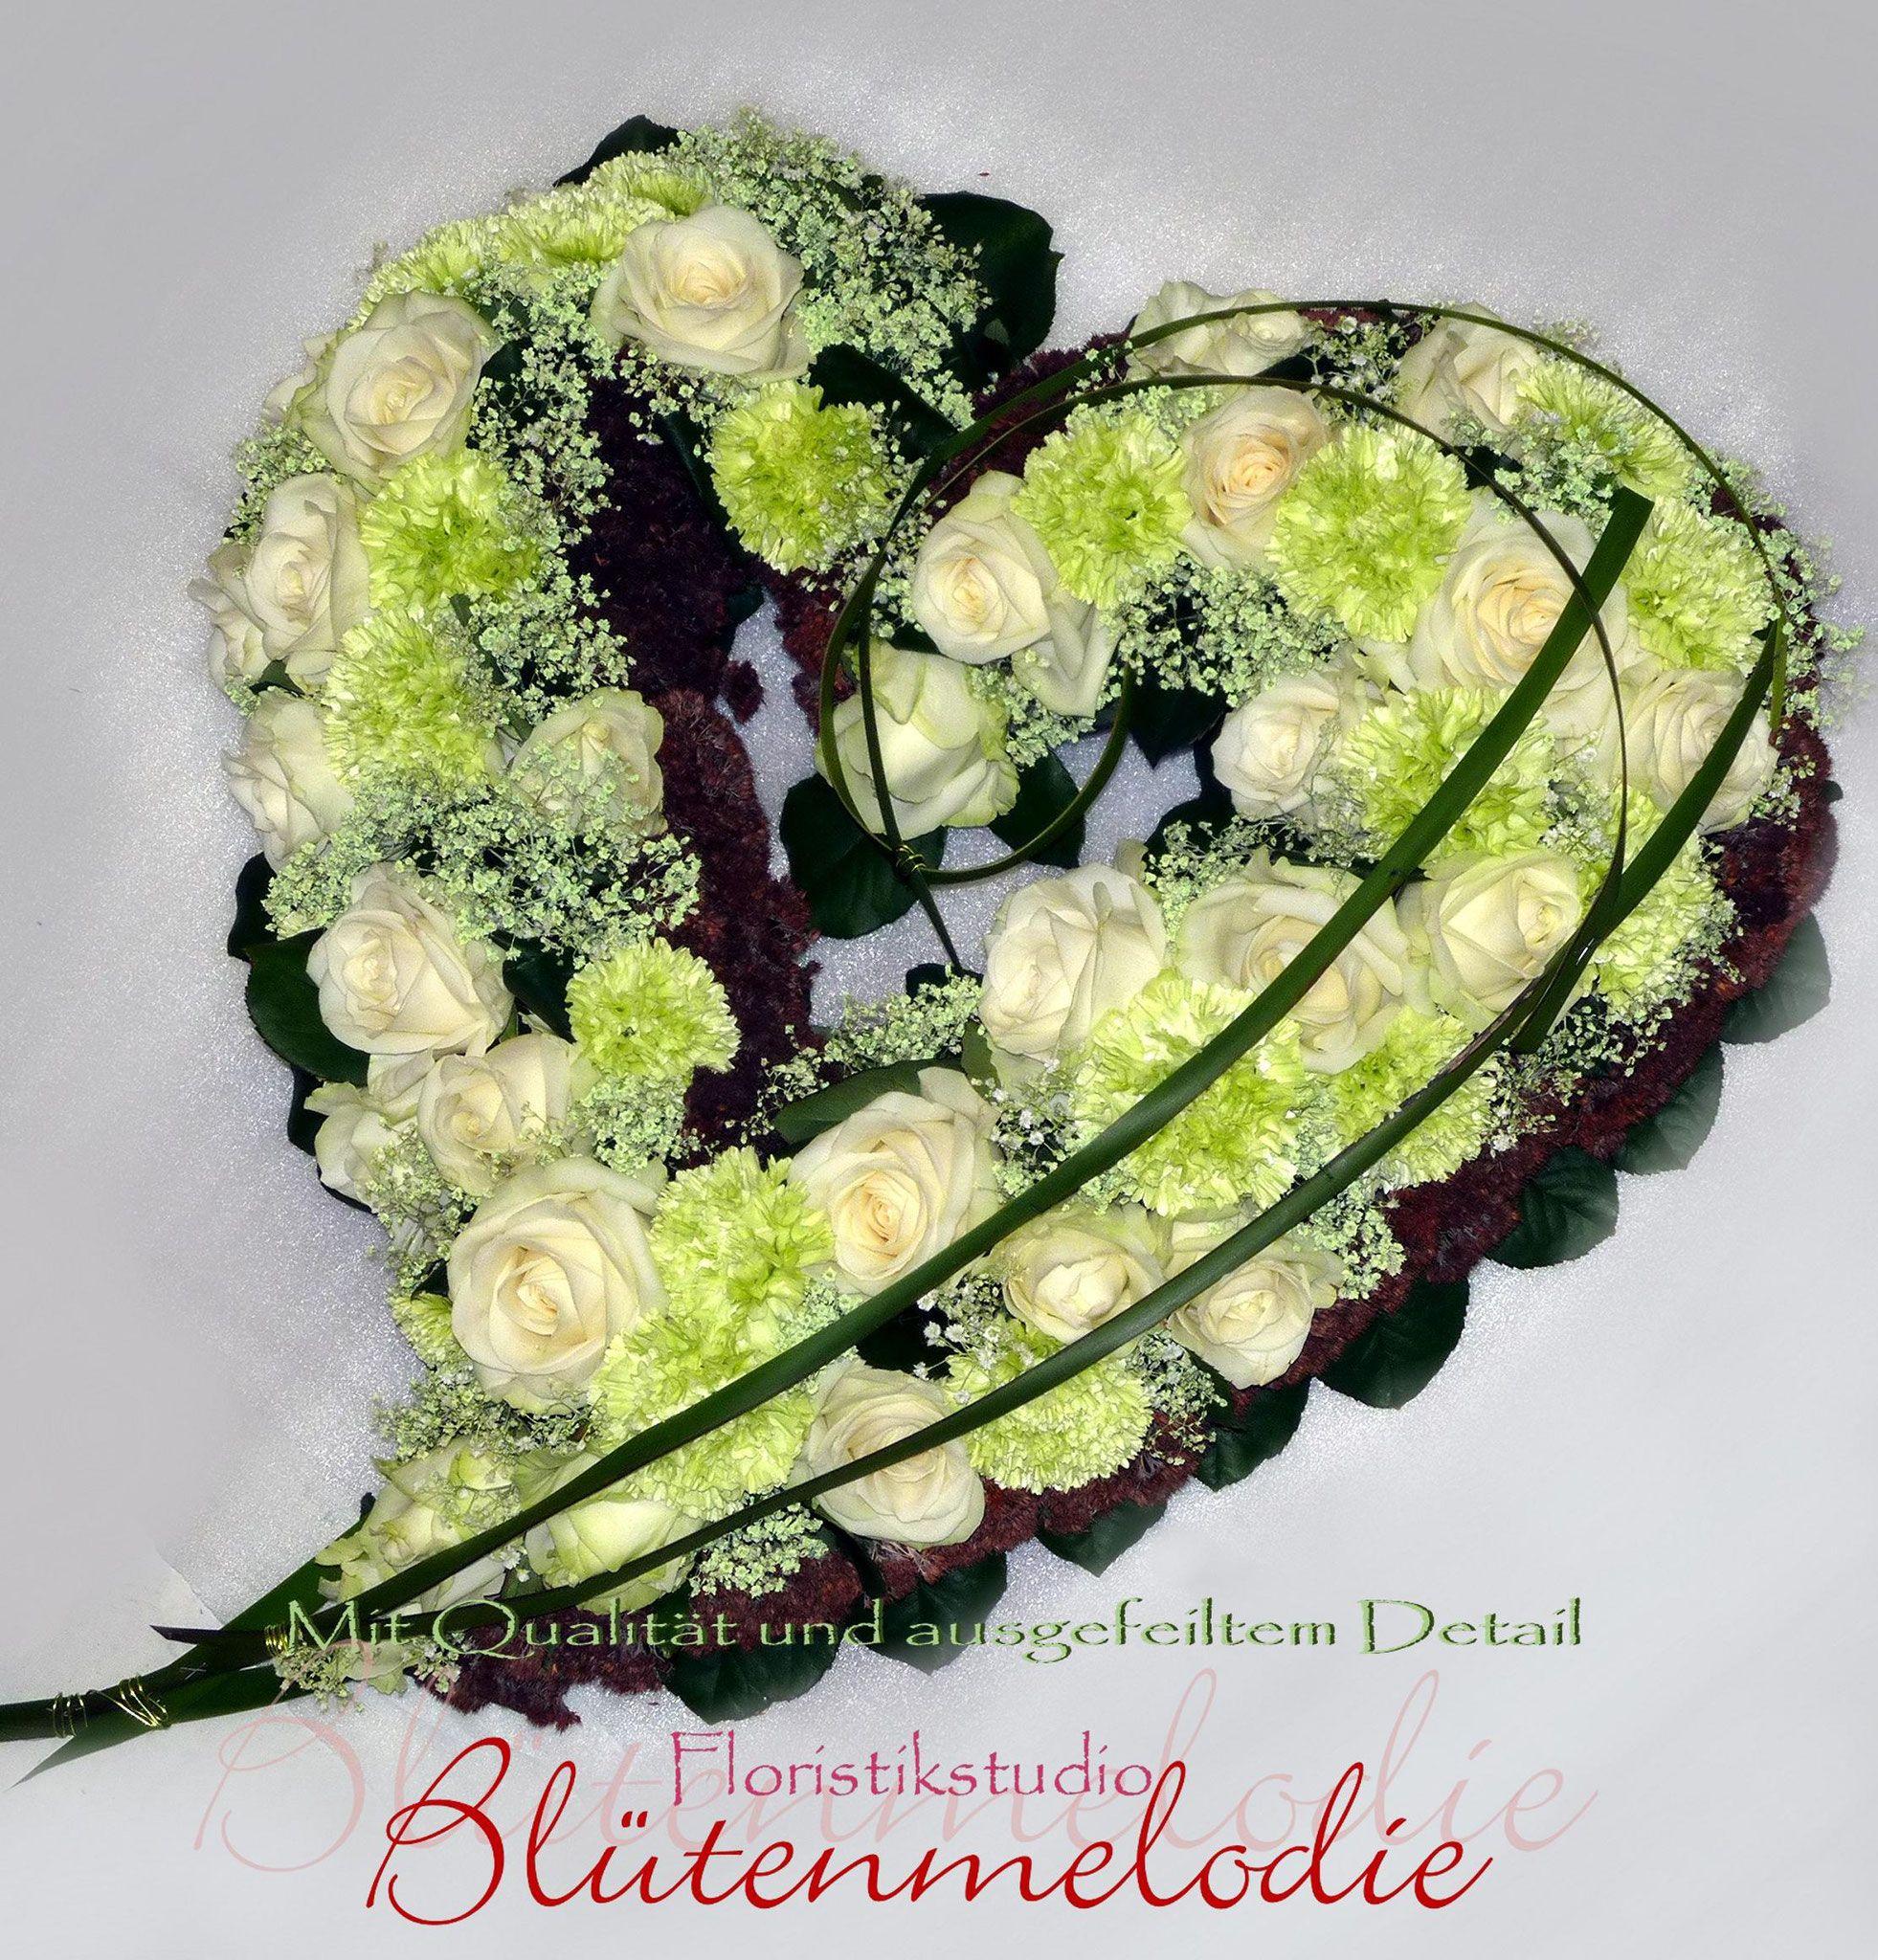 Trauer-Herzen - Blütenmelodie Floristikstudio Fröse #friedhofsdekorationenallerheiligen